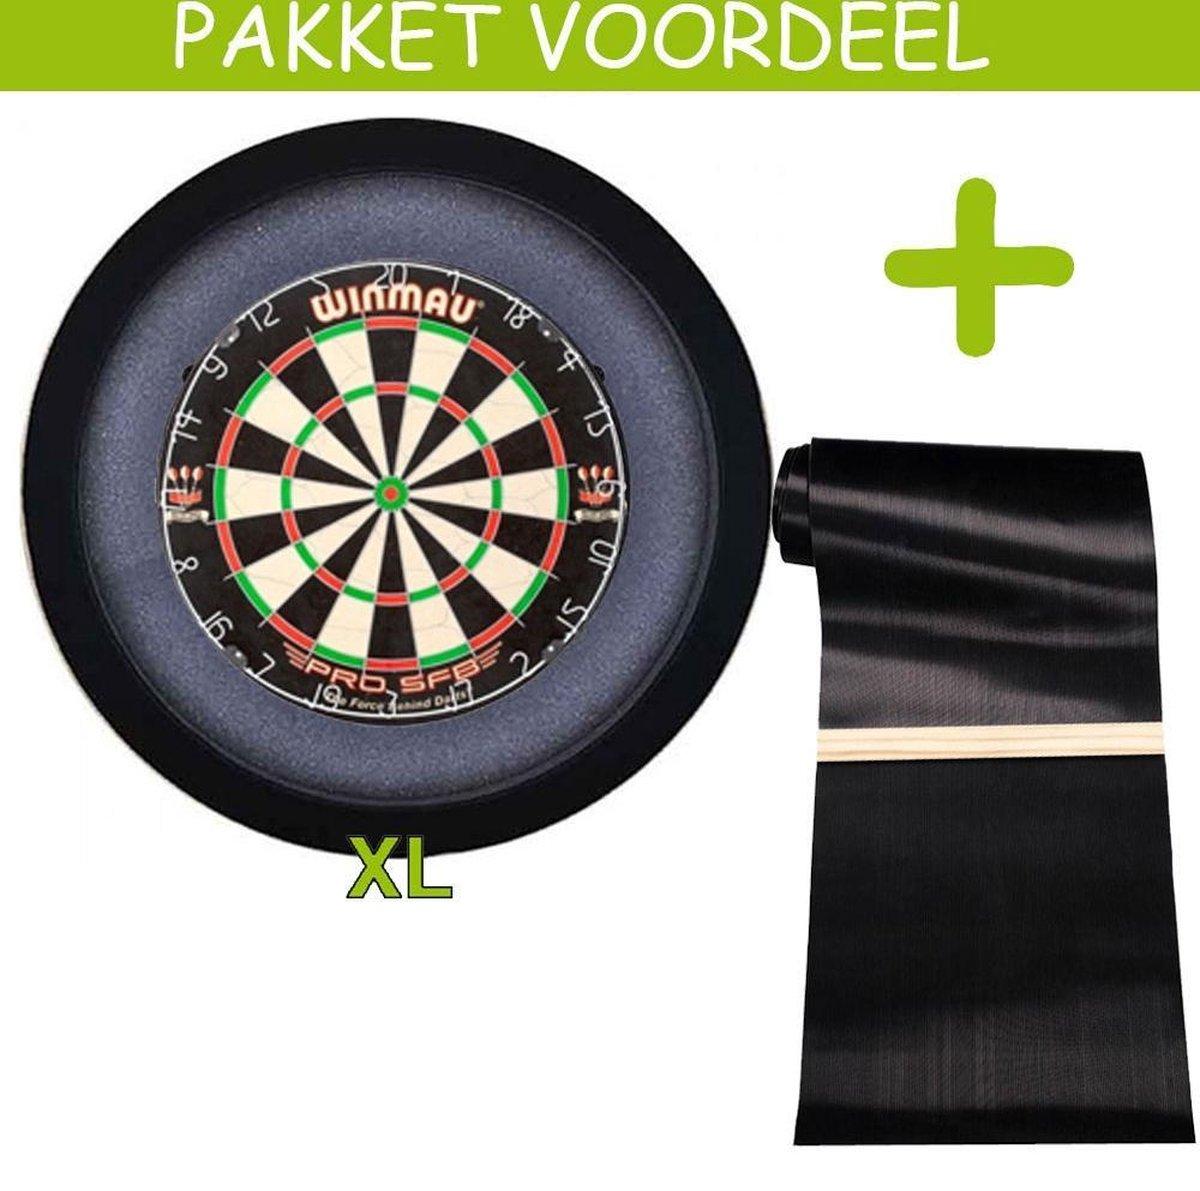 Dartbaan Pro - Pro SFB - 90 x 300 Inclusief Oche - Dartbordverlichting Basic XL - (Zwart)